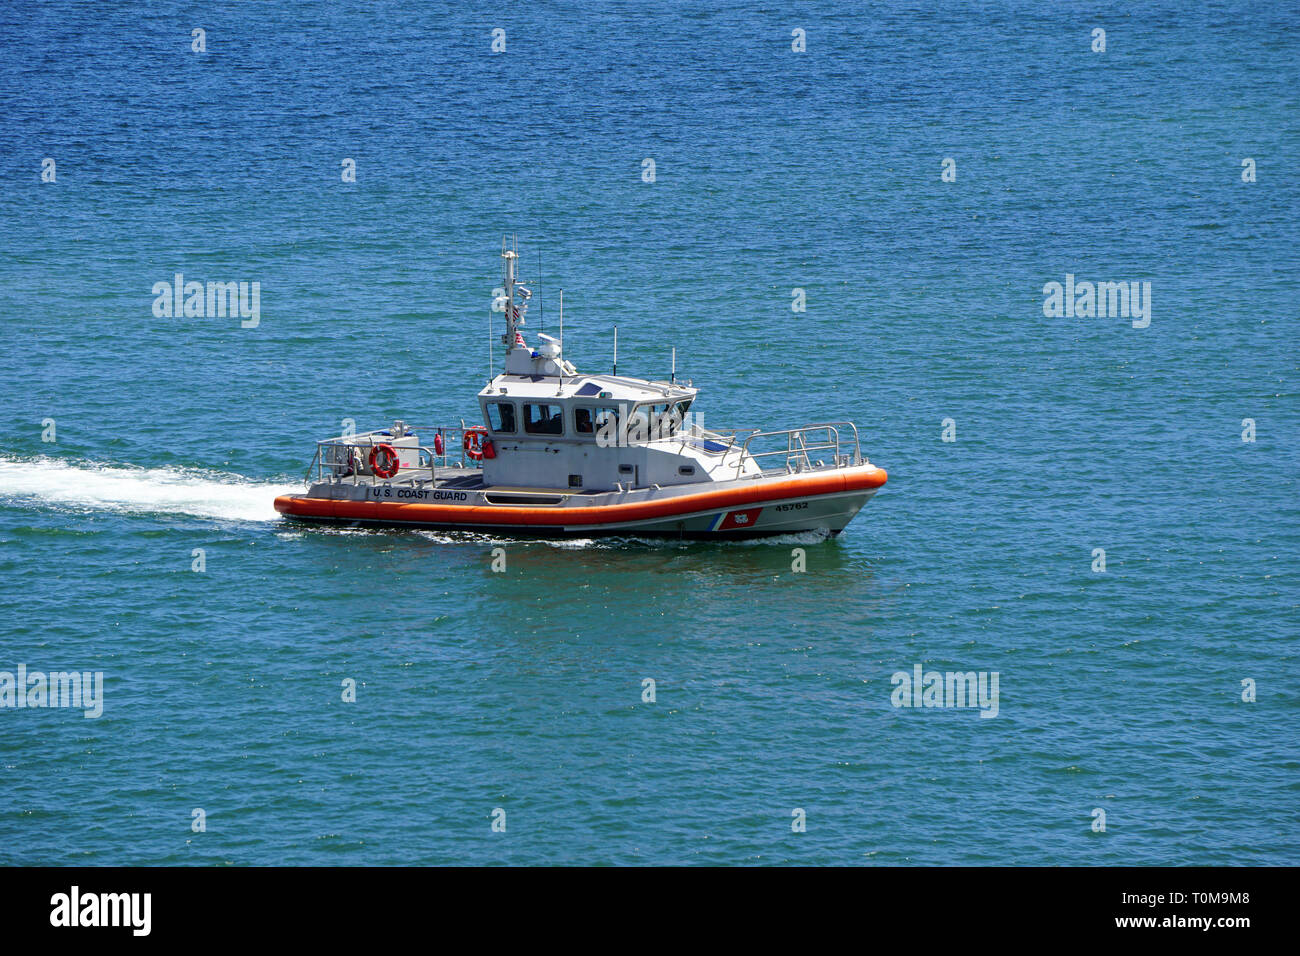 7dceee76853 Coast Guard Response Boat Photos   Coast Guard Response Boat Images ...